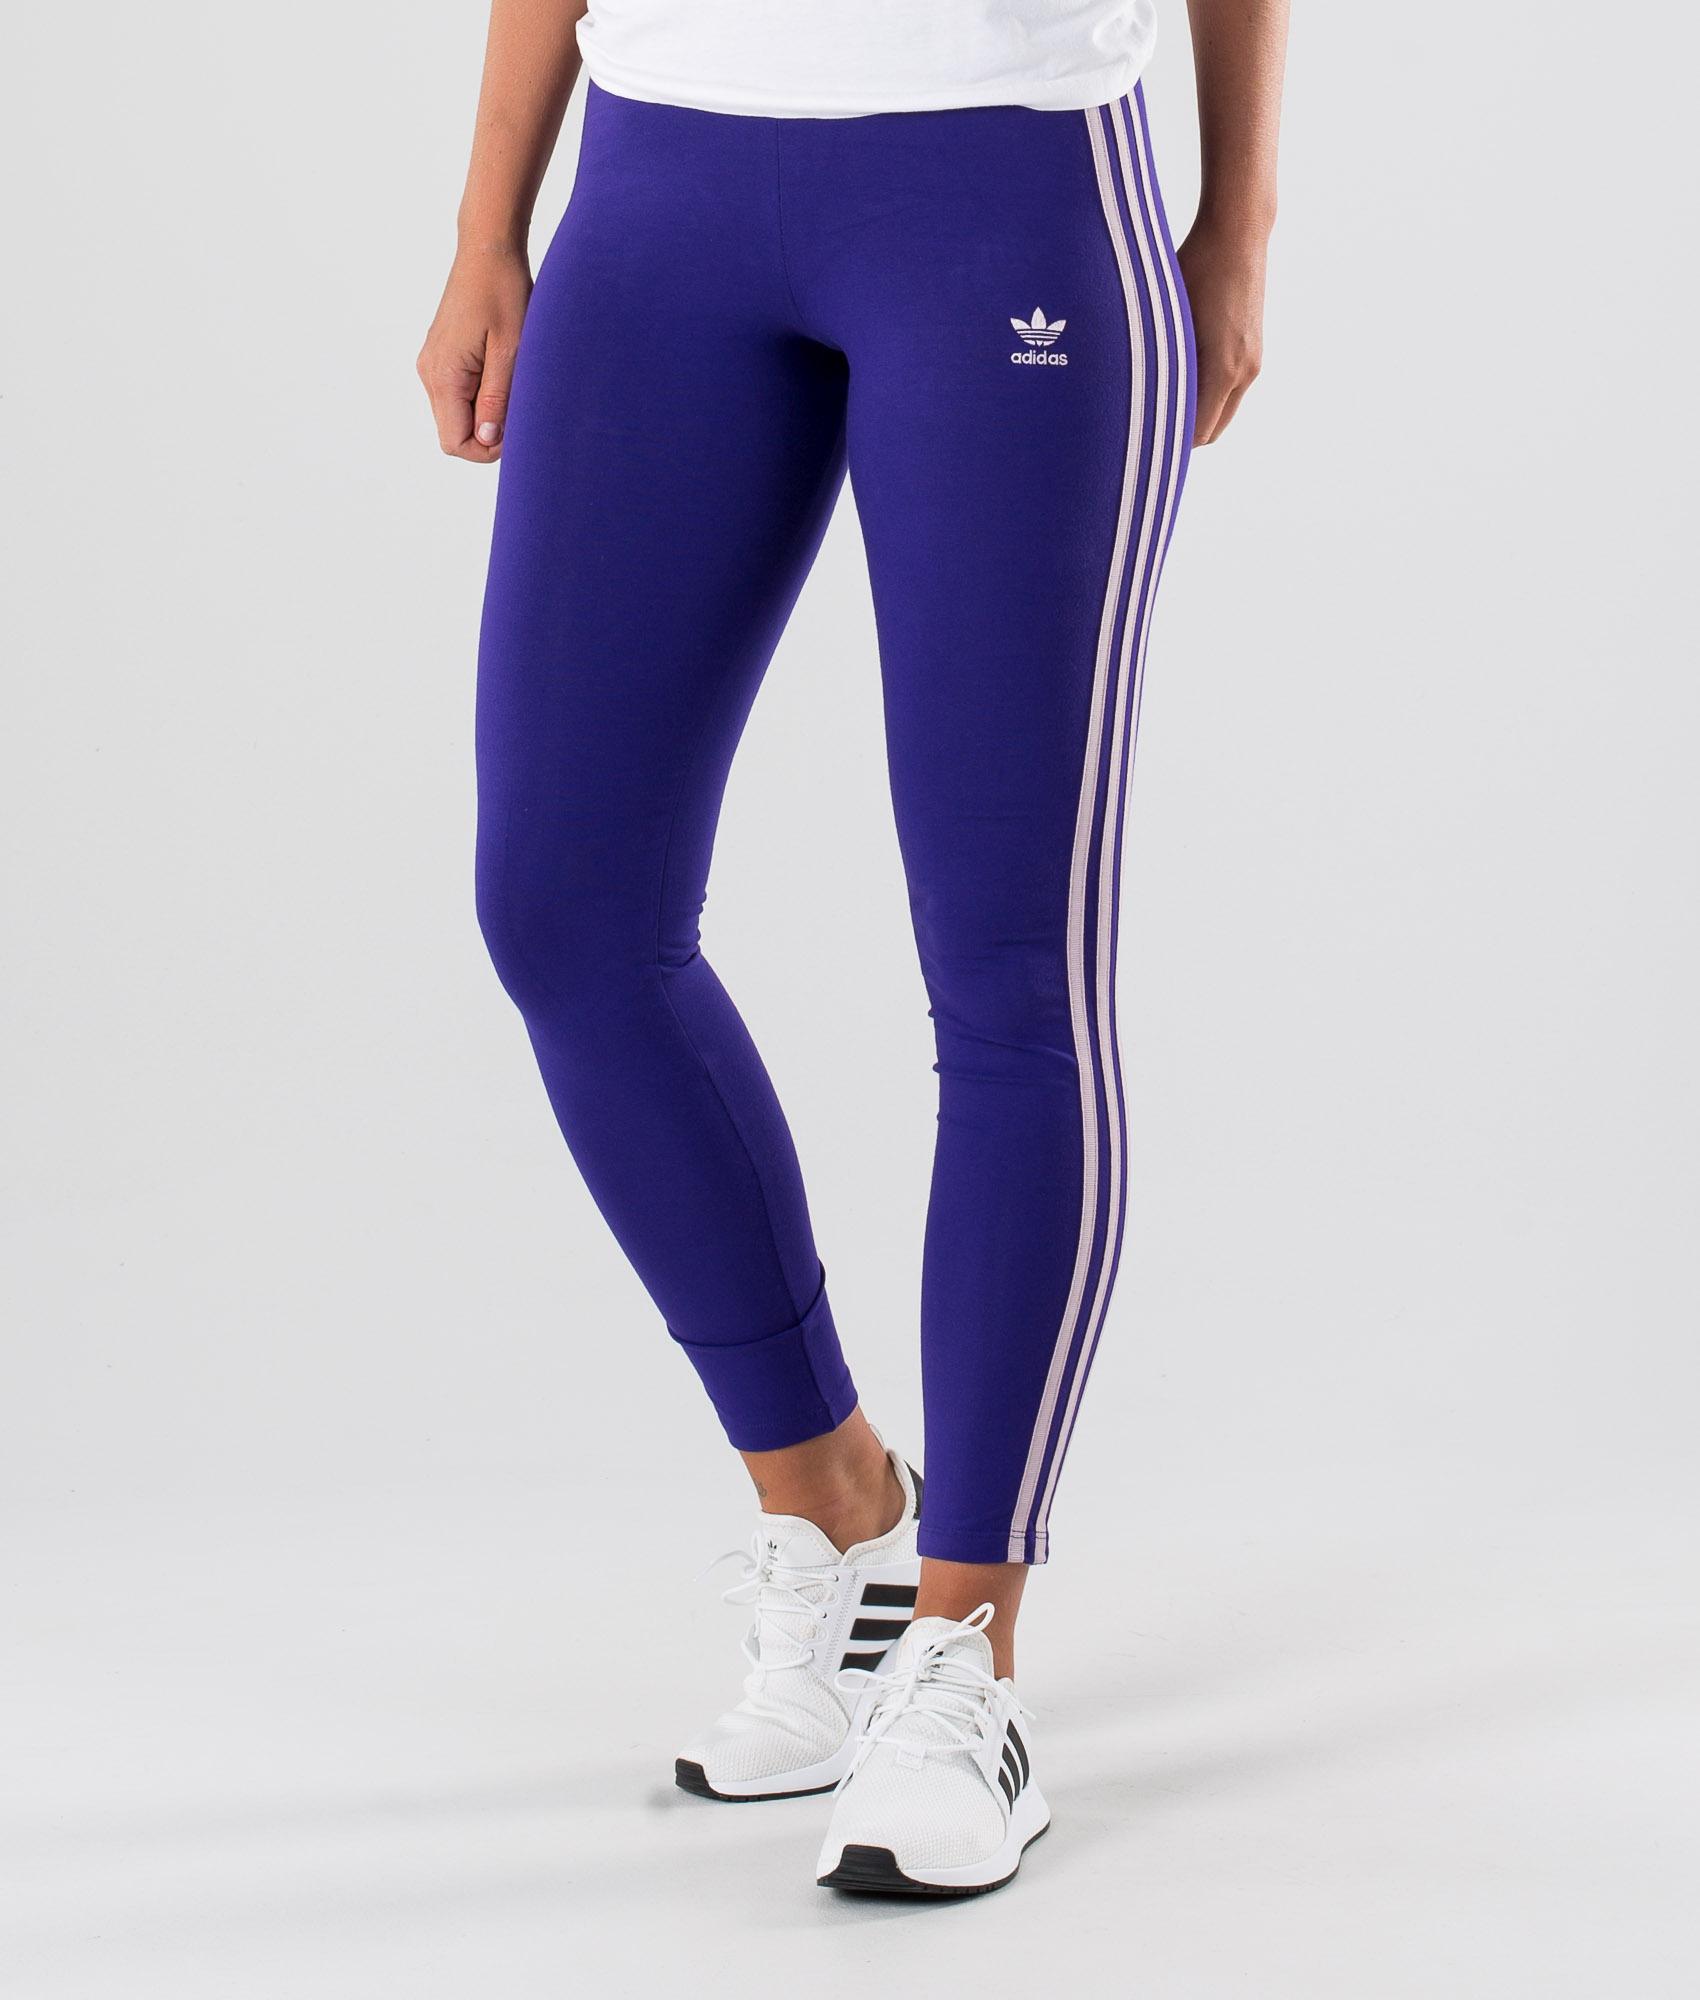 3 Stripes Tight Leggings